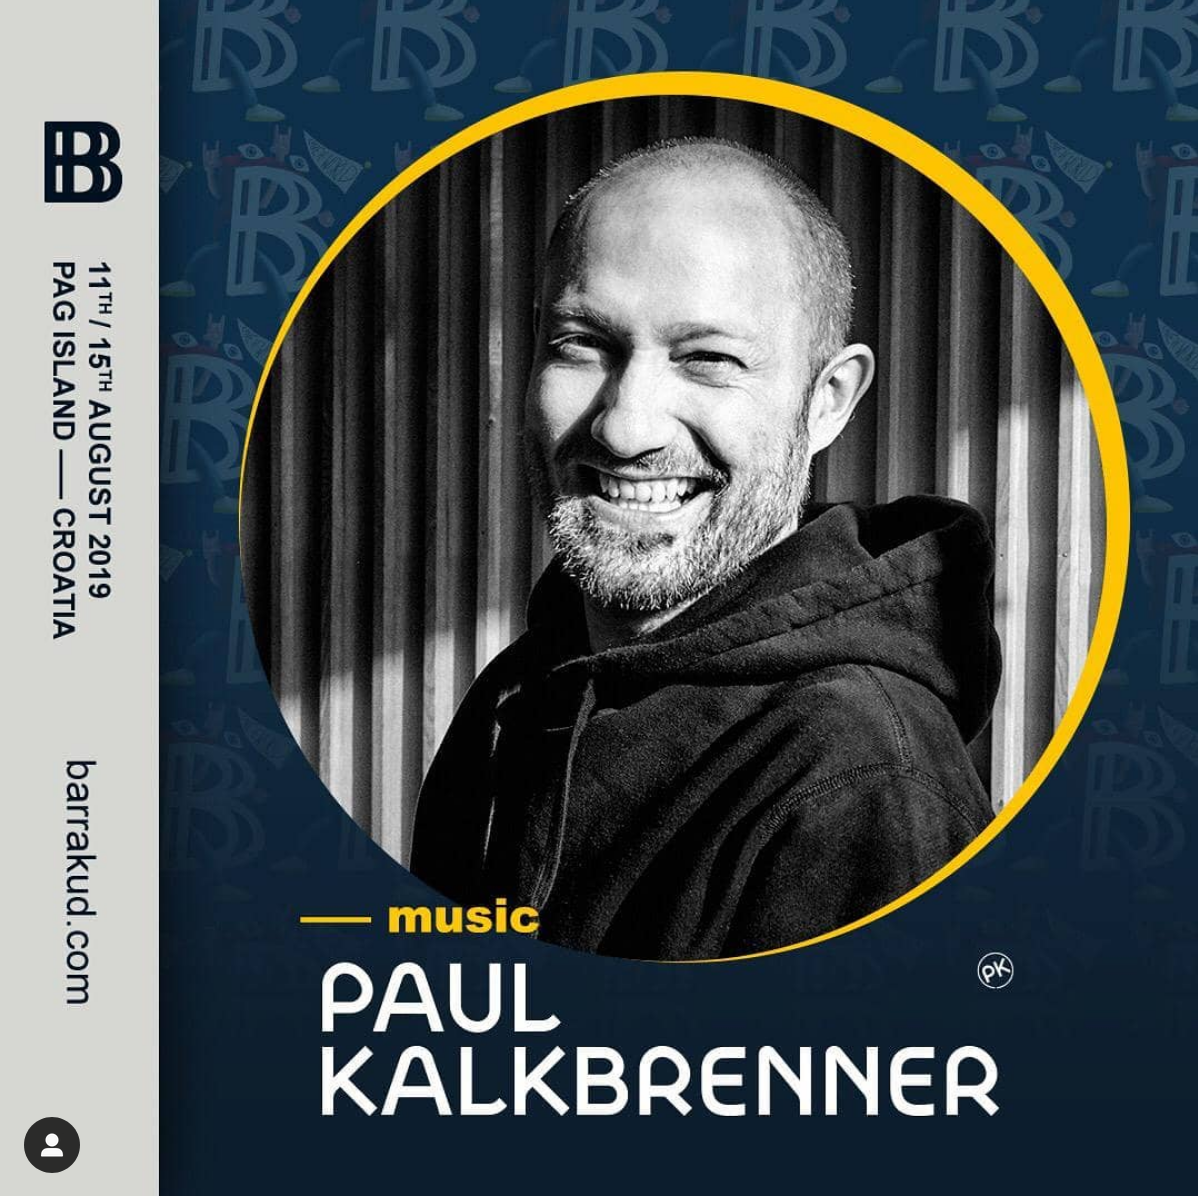 Paul Kalkbrenner 13.8. v klube Papaya